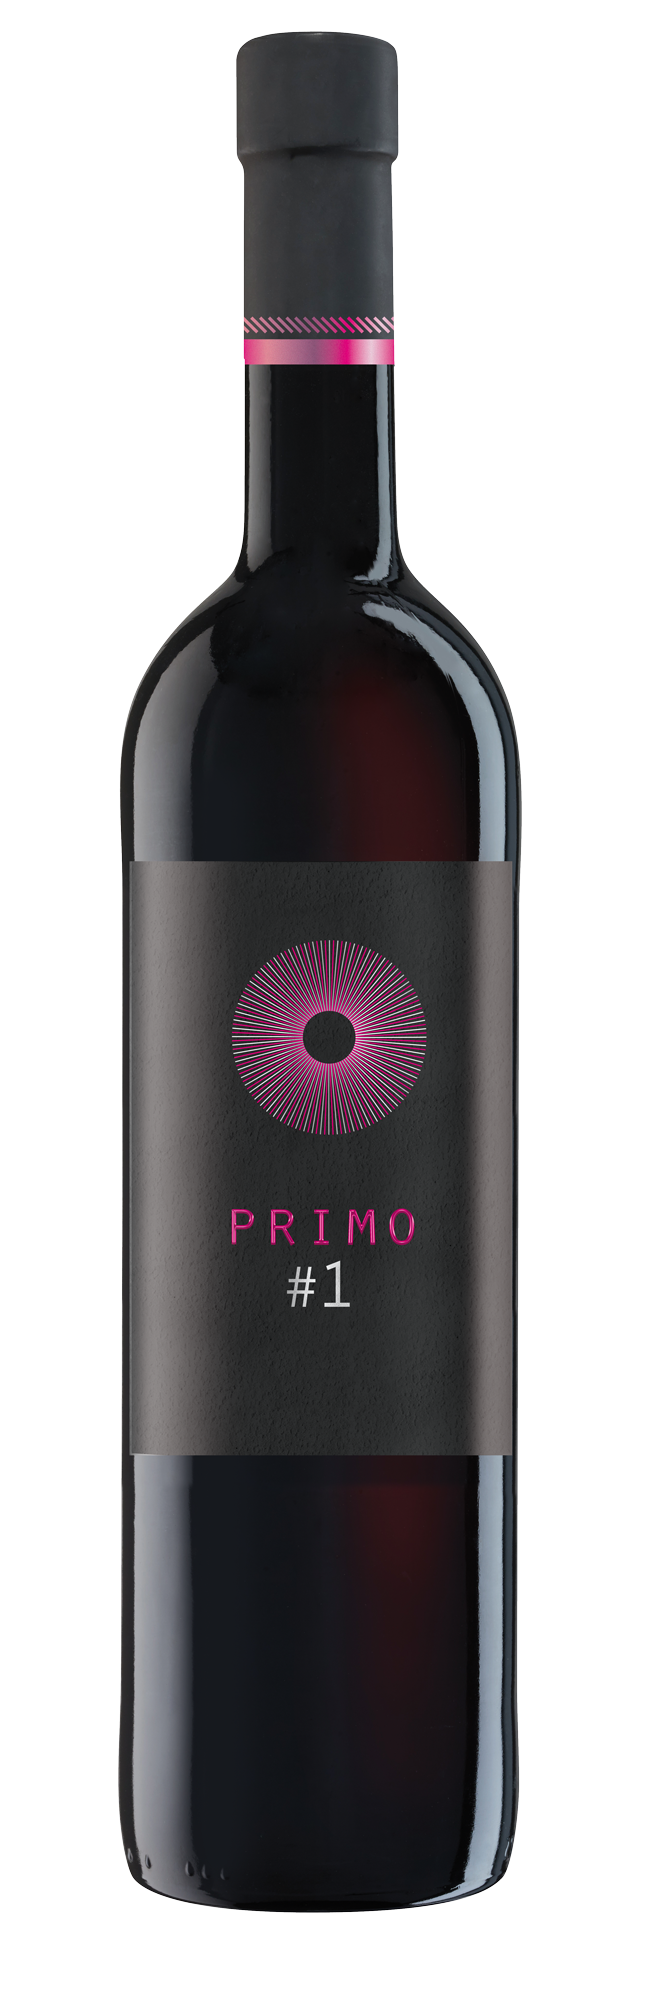 PRIMO #1 Rotwein